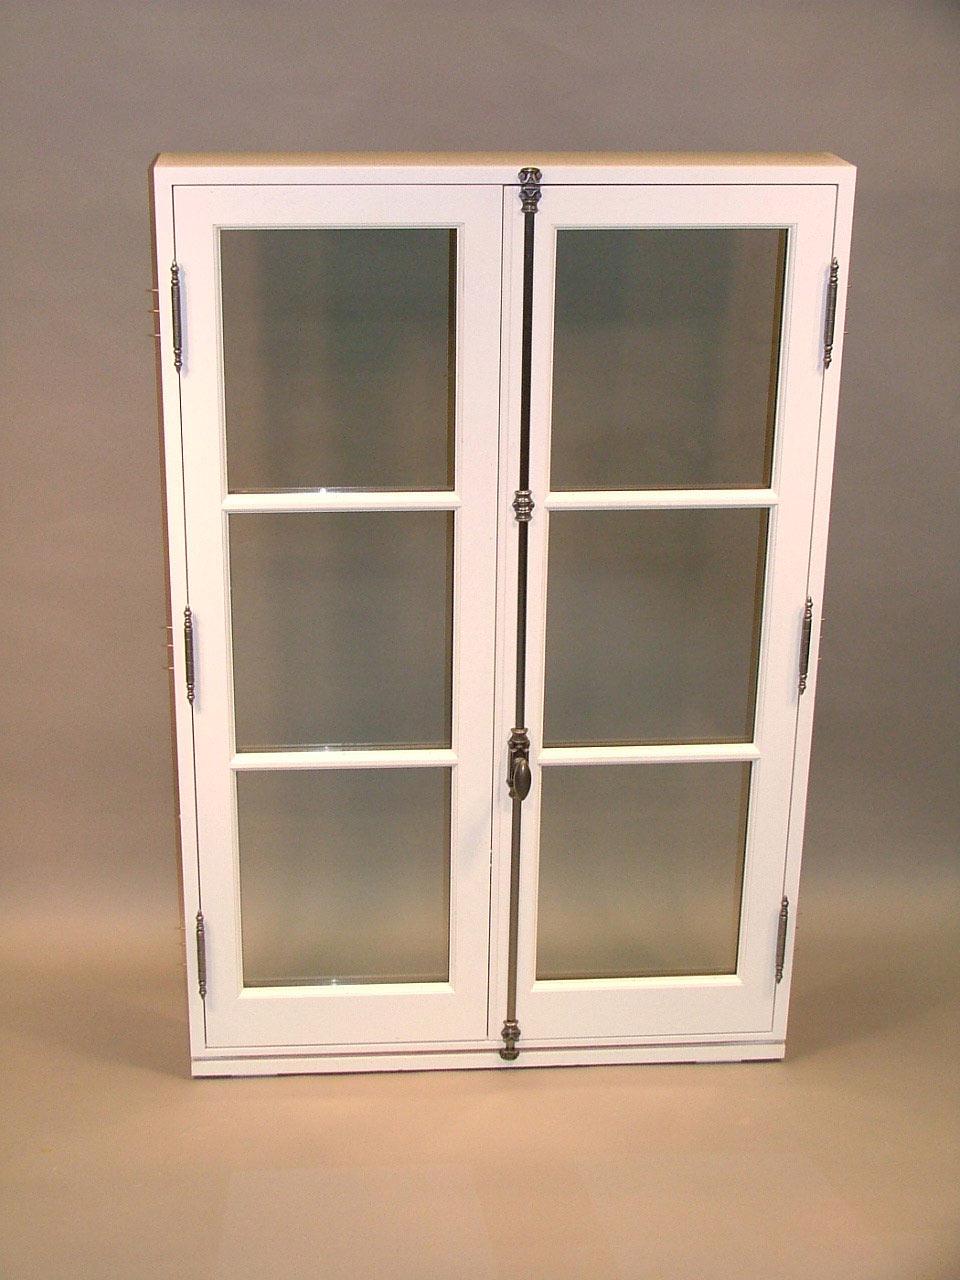 French Casement Window Specifications H Hirschmann Ltd Architectural Windows Doors